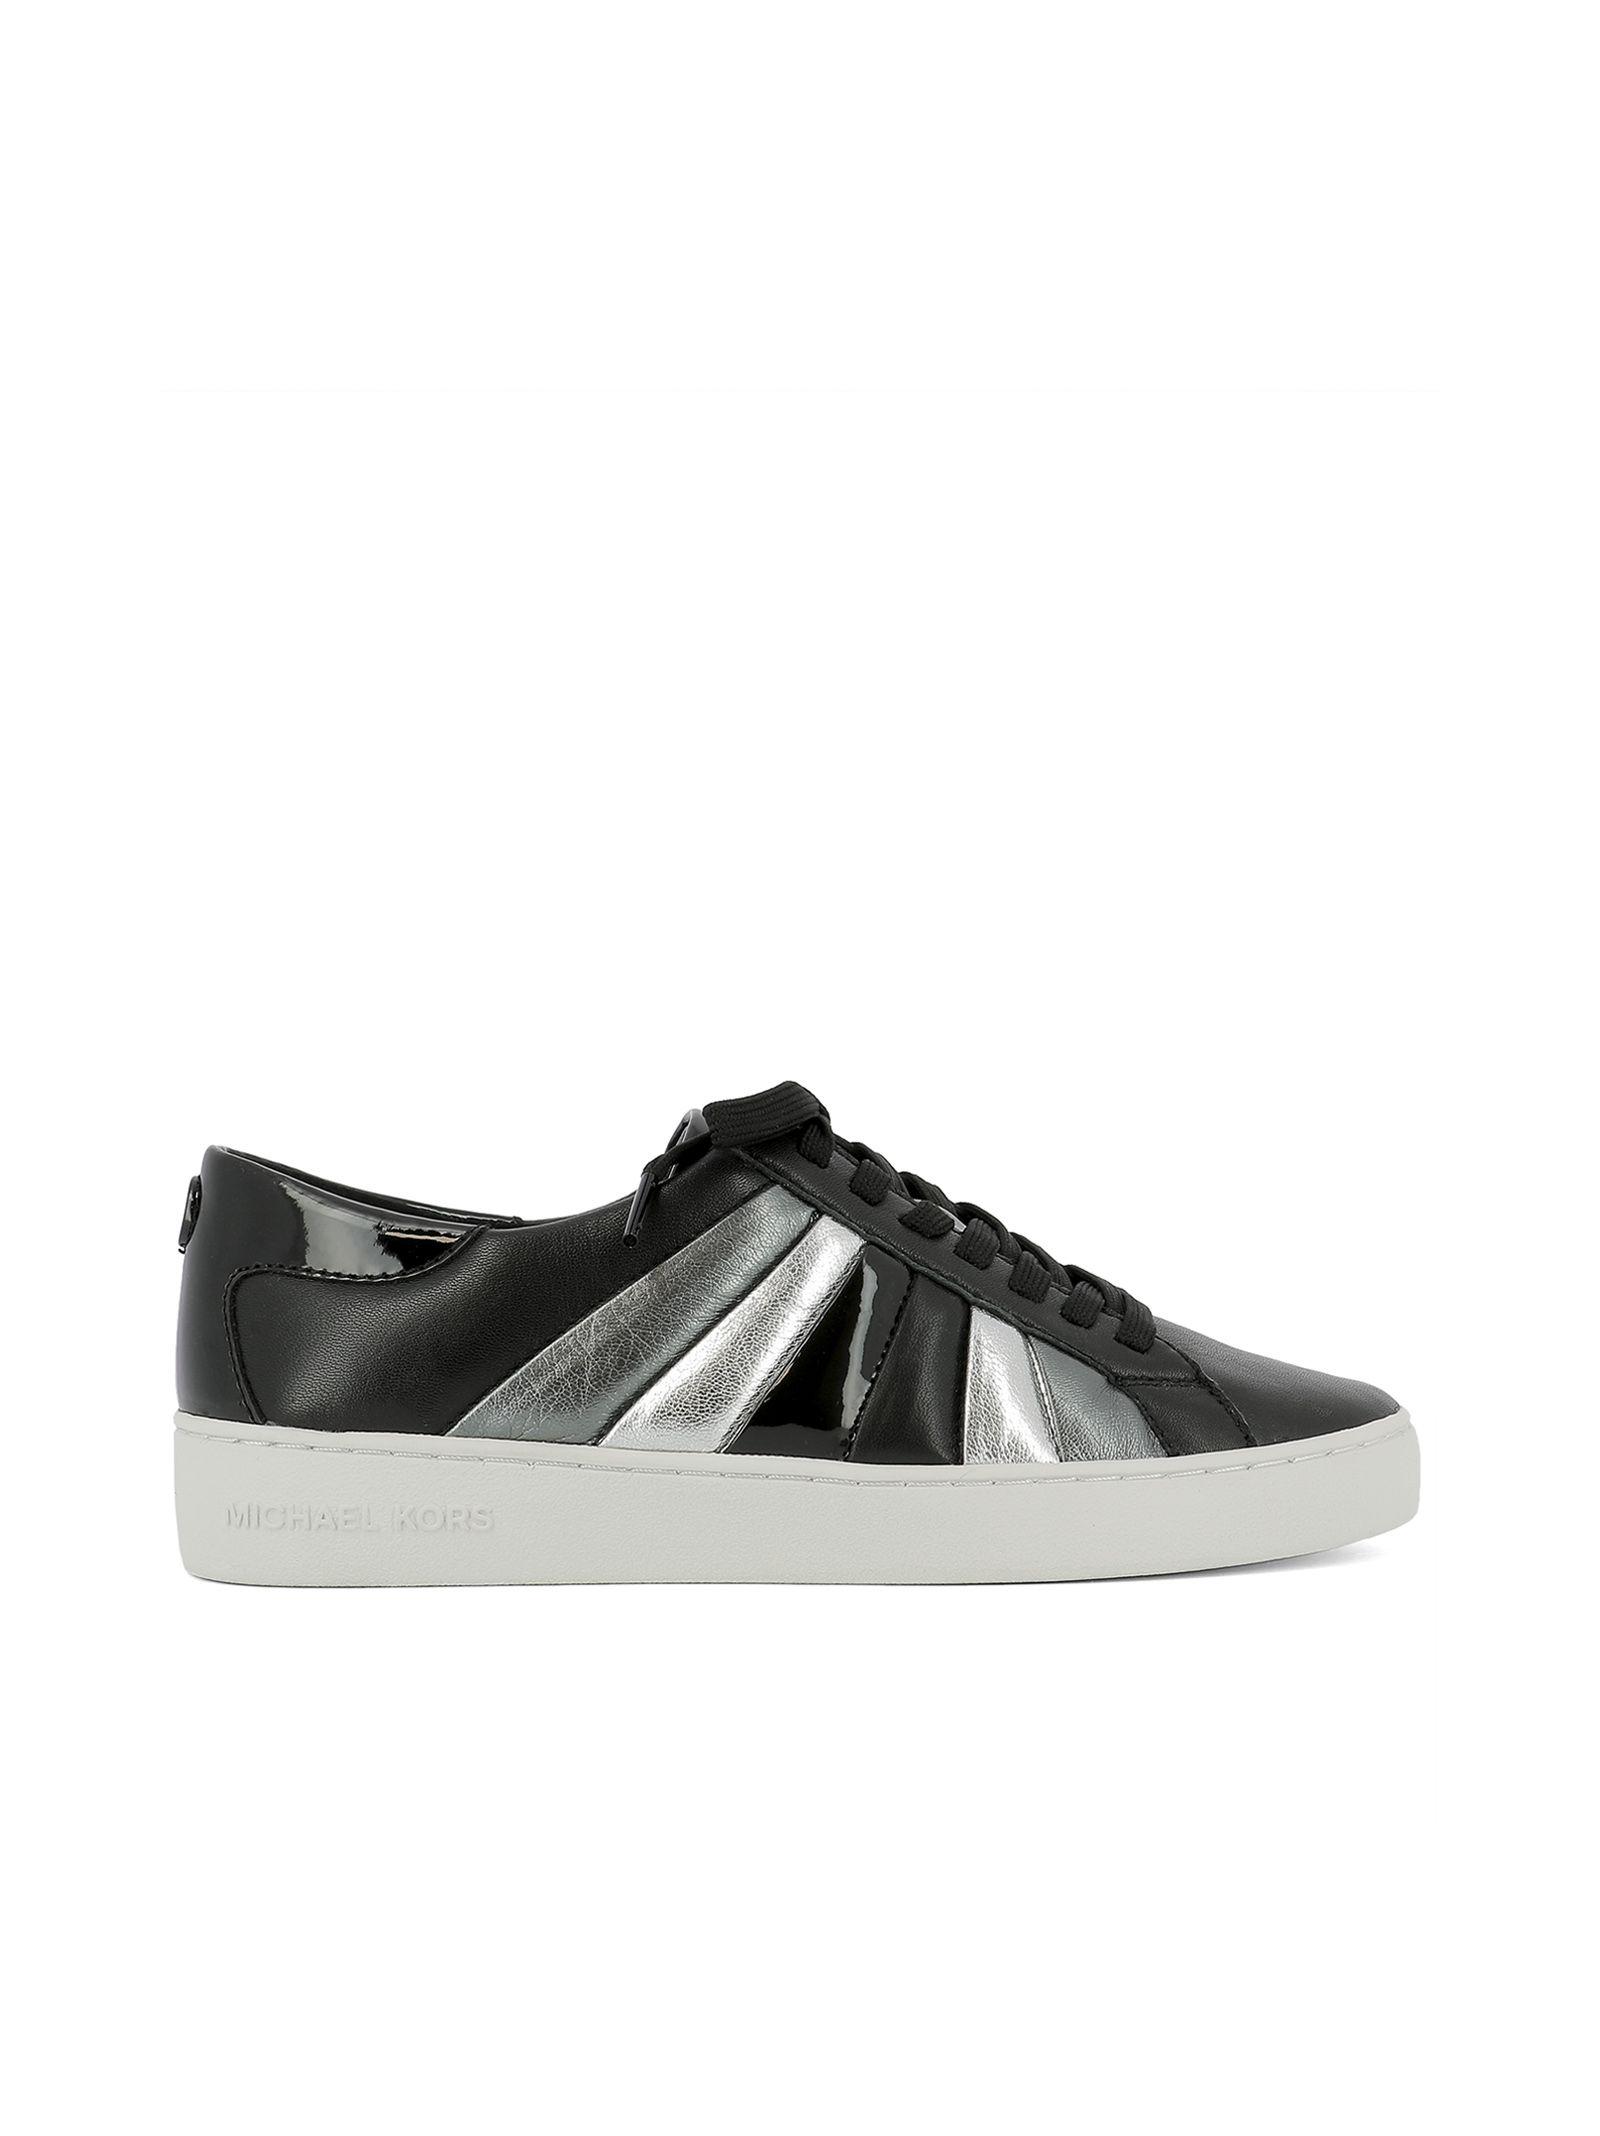 michael kors female black leather sneakers